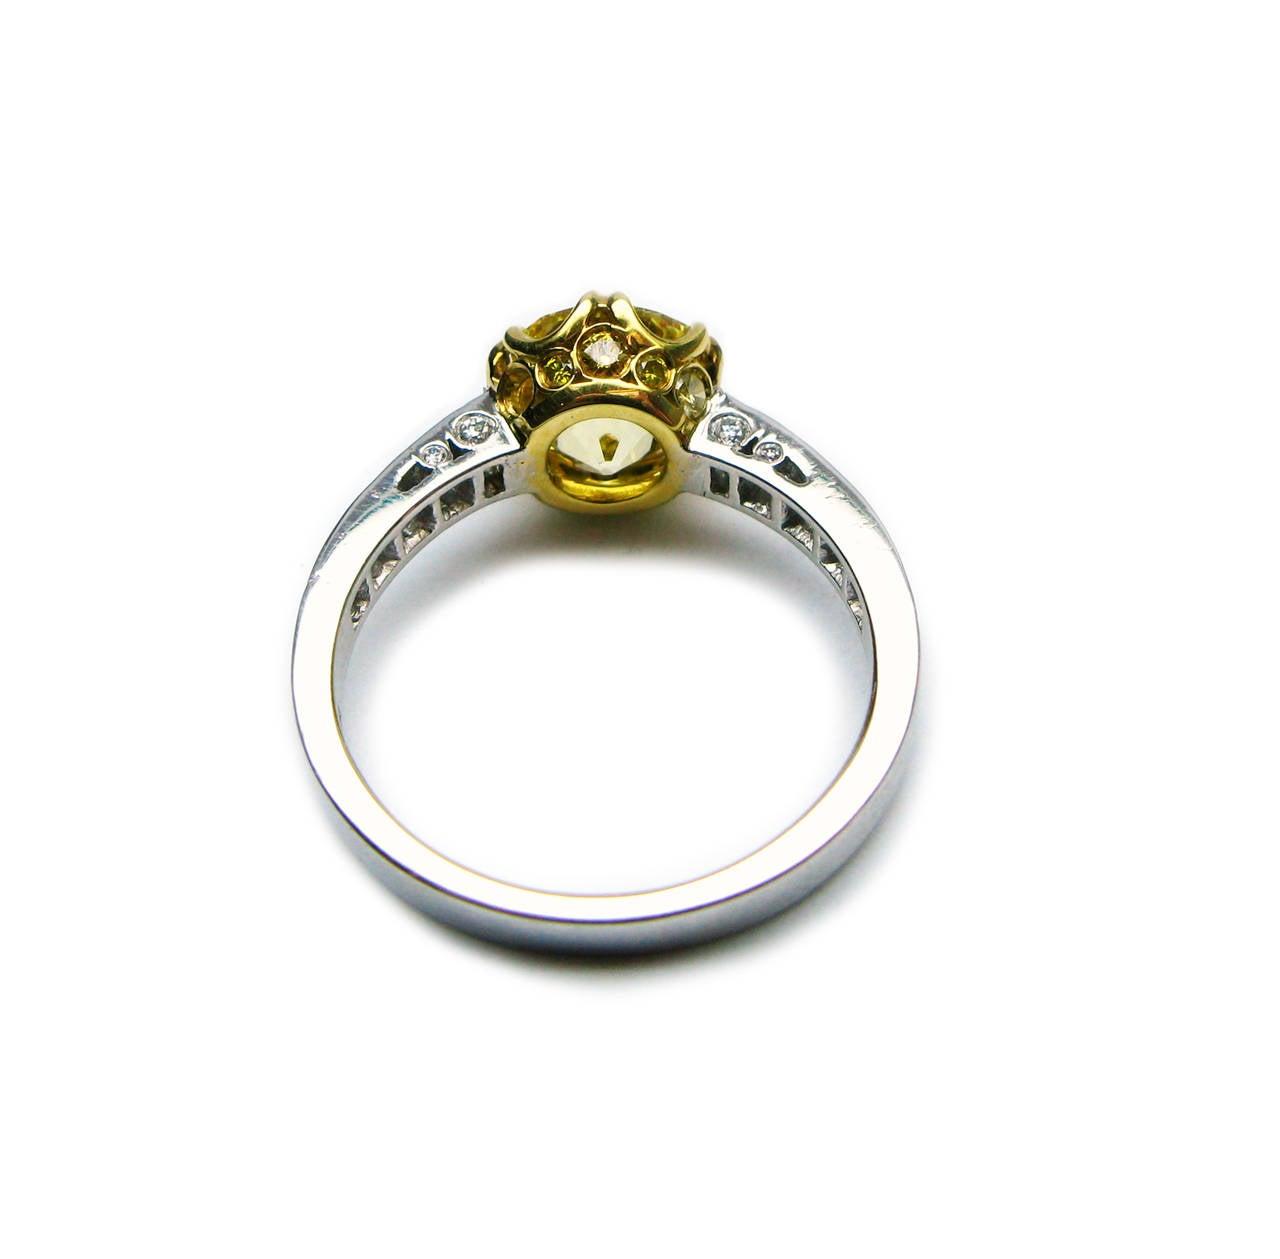 1.92 Carat GIA Fancy Intense Yellow Old Mine Brilliant Diamond Ring 4